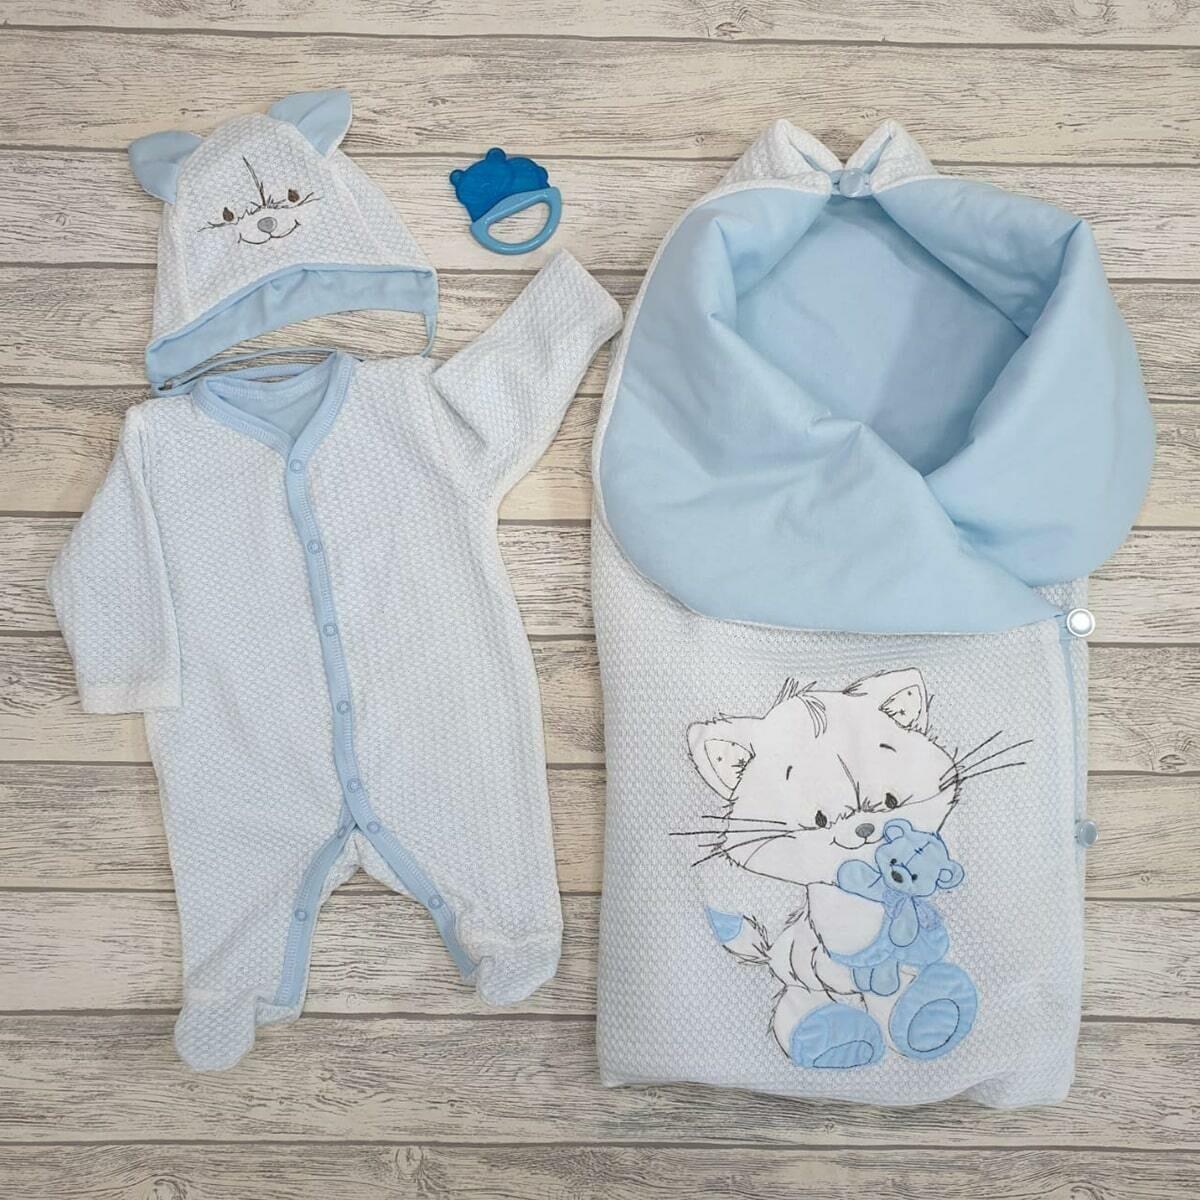 Комплект на выписку «Cute Kitty», (лето/демисезон/зима), голубой